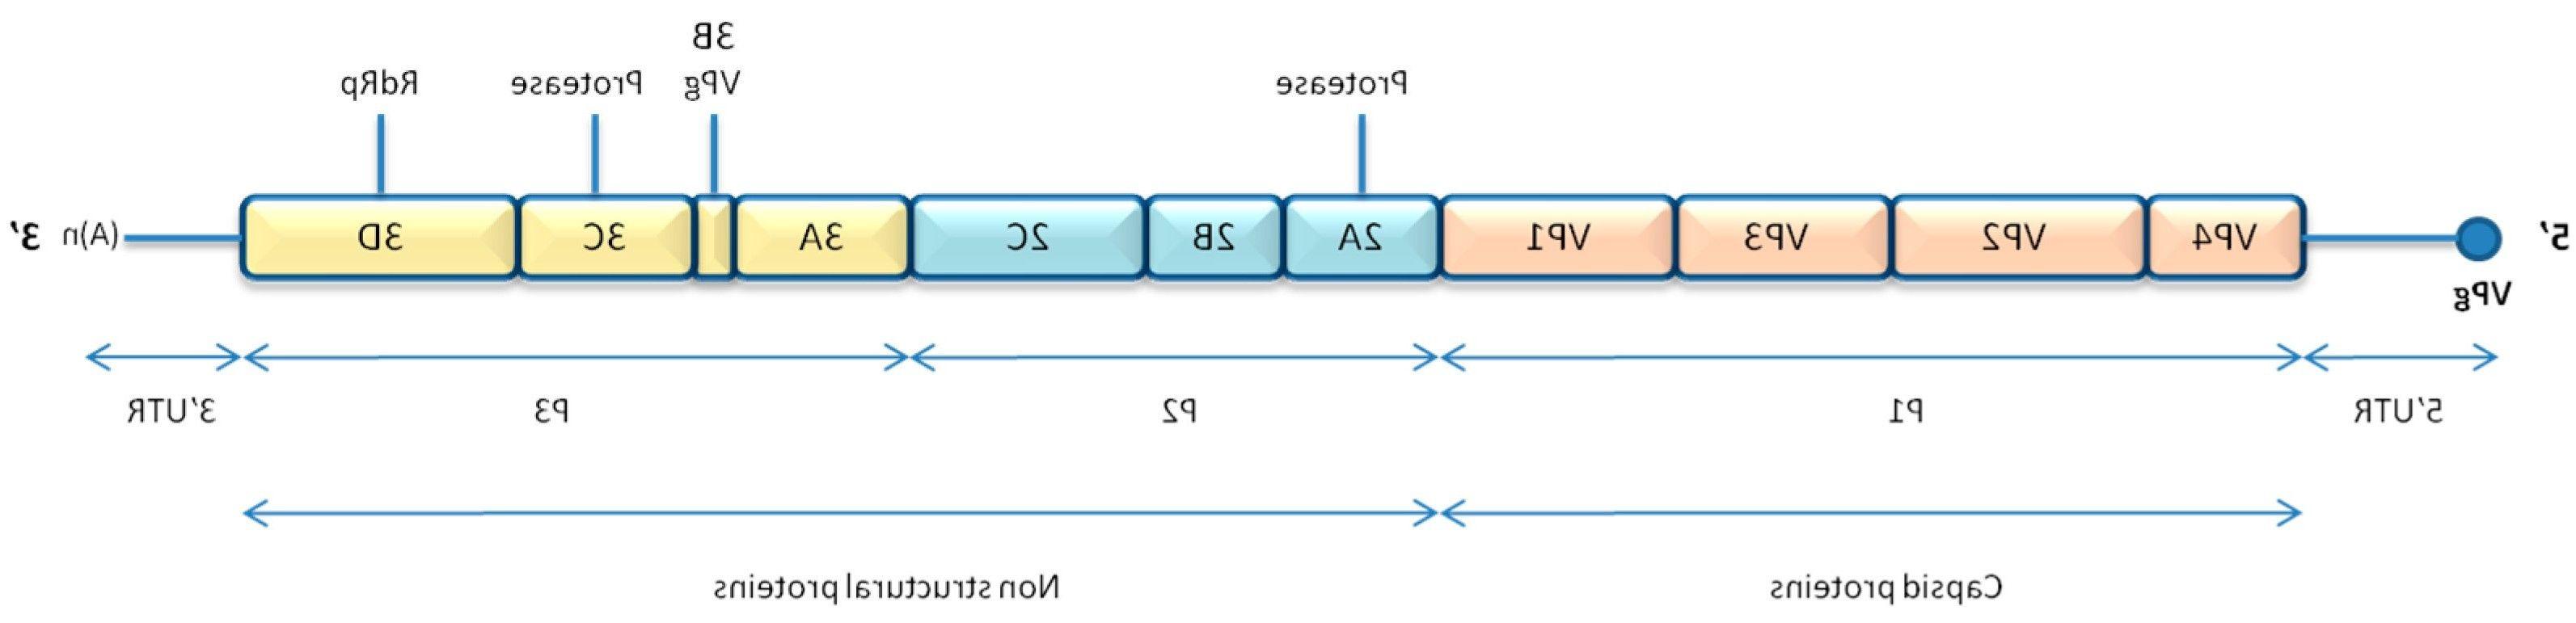 Beautiful Devis Bricoman Periodic Table Diagram